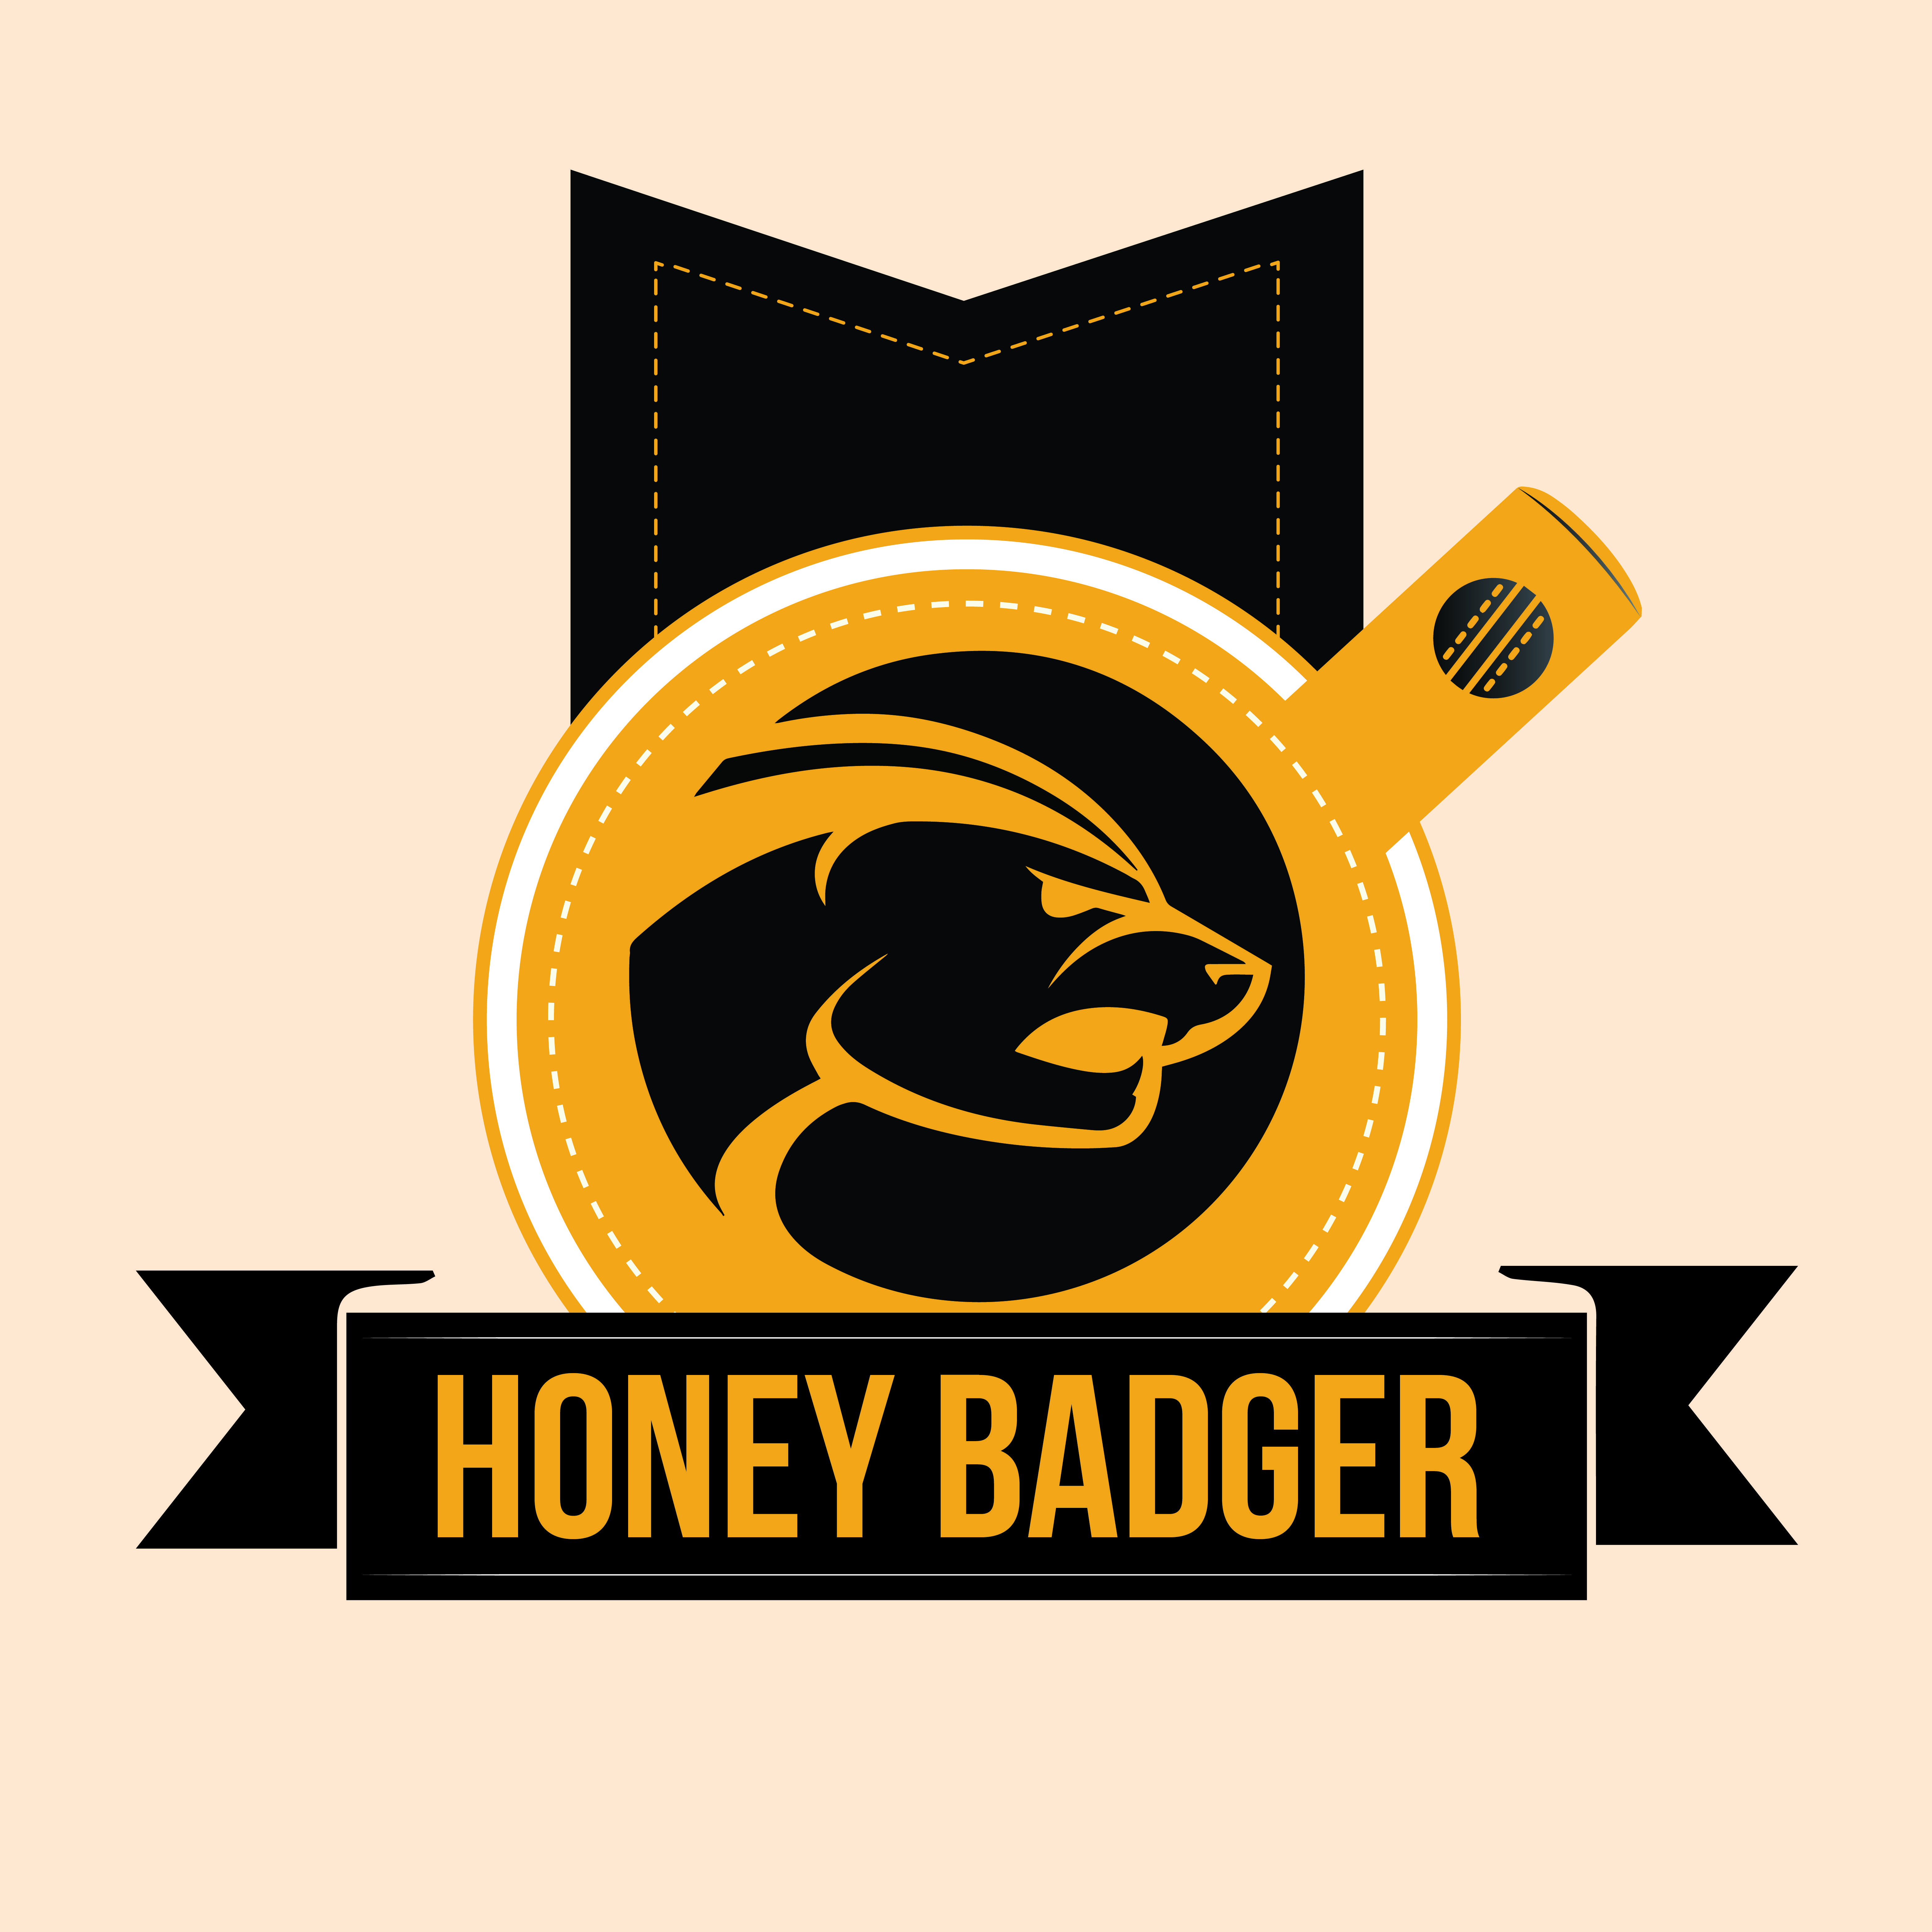 It Company Diseño de Logo for Honey Badger por Soumava